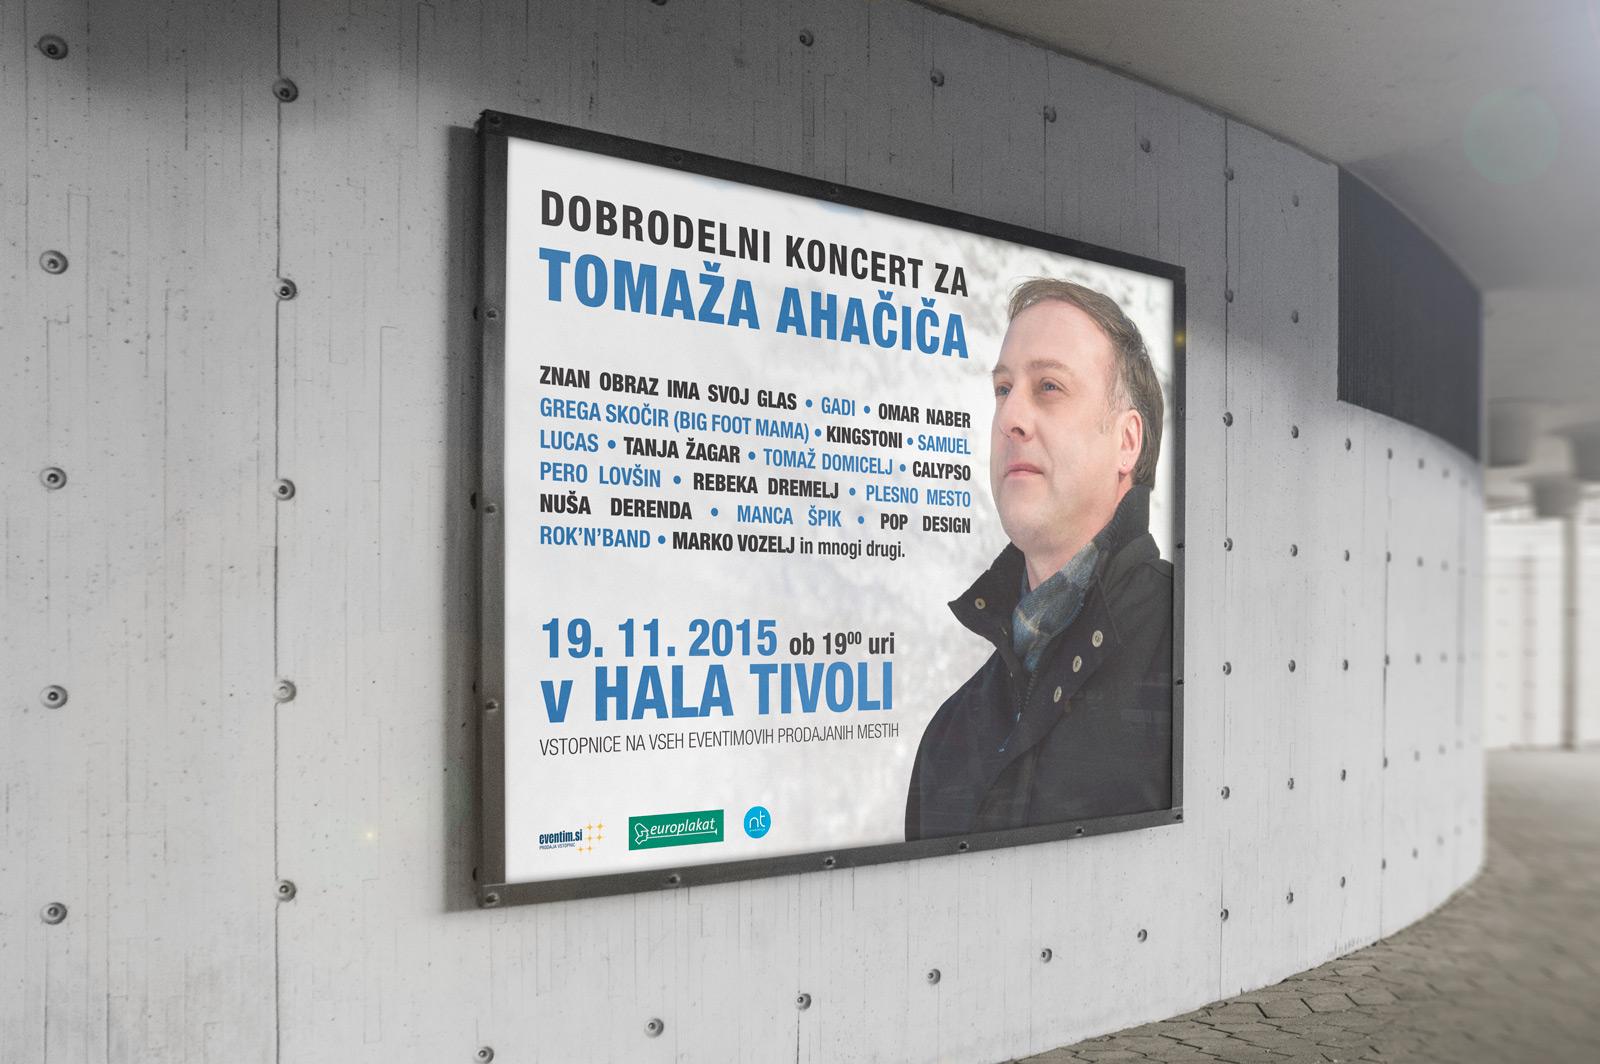 Dobrodelni koncert za Tomaža Ahačica